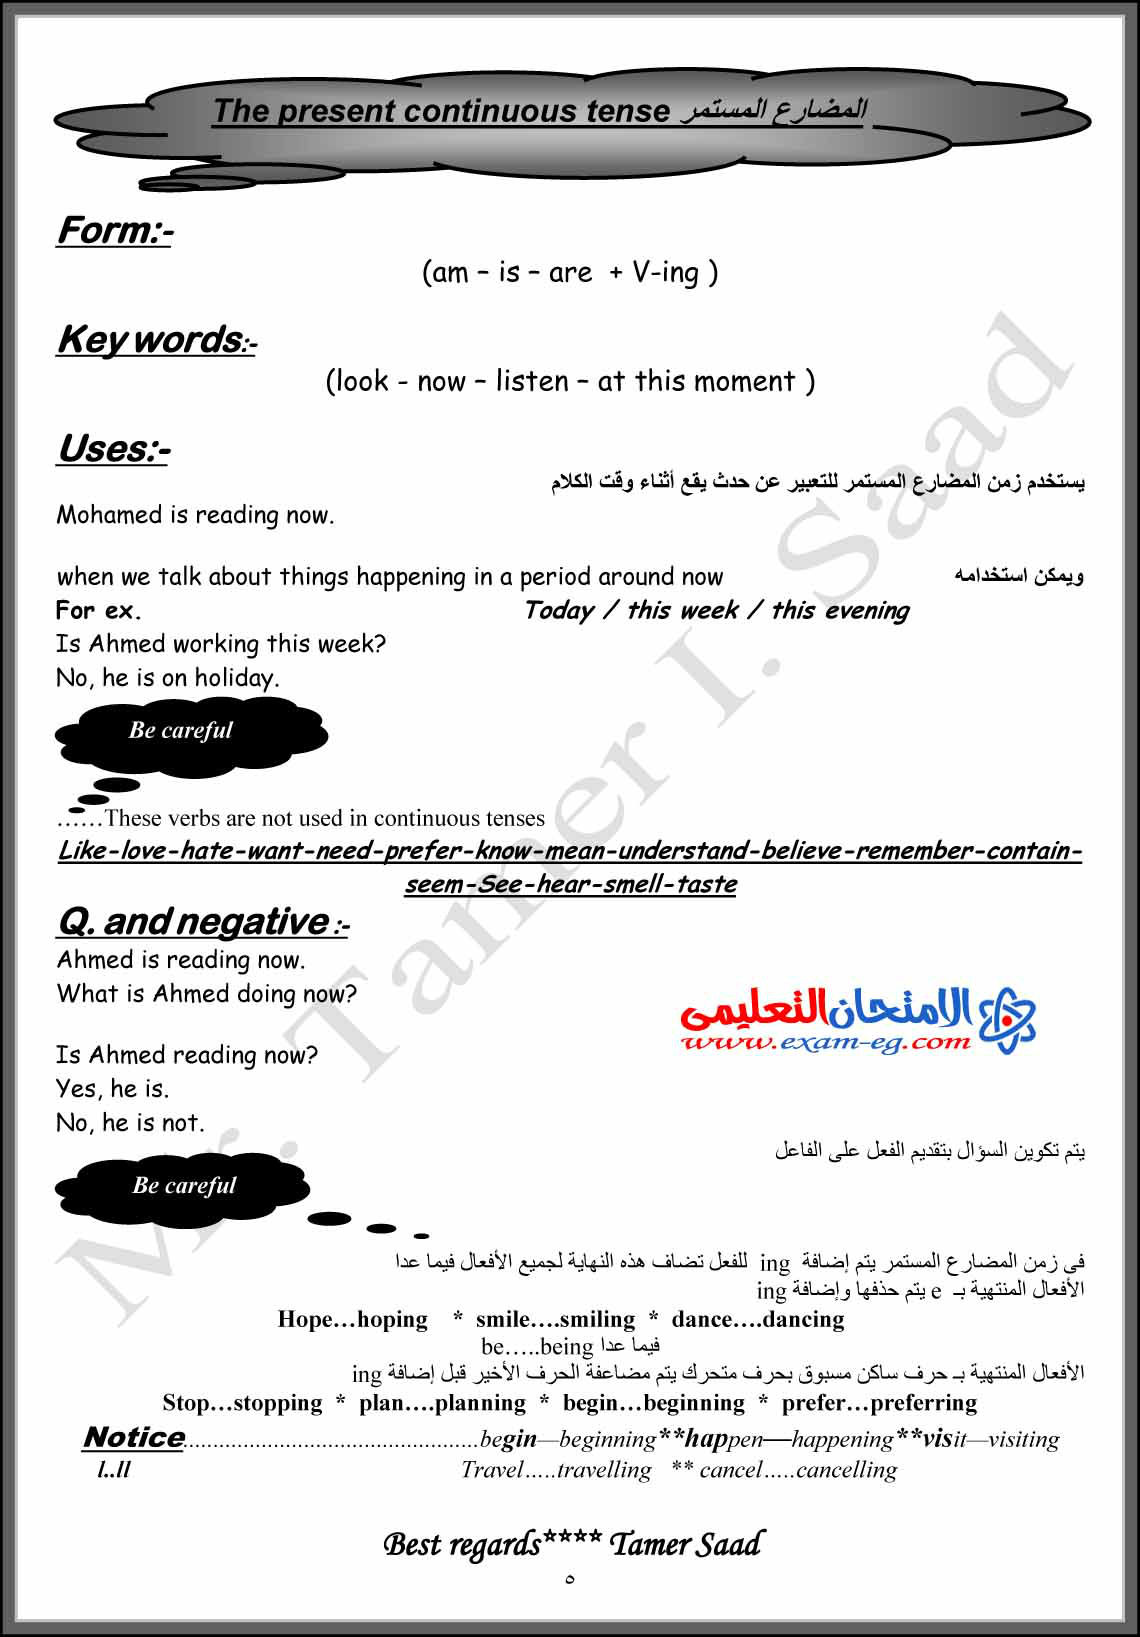 exam-eg.com_1442845239655.jpg